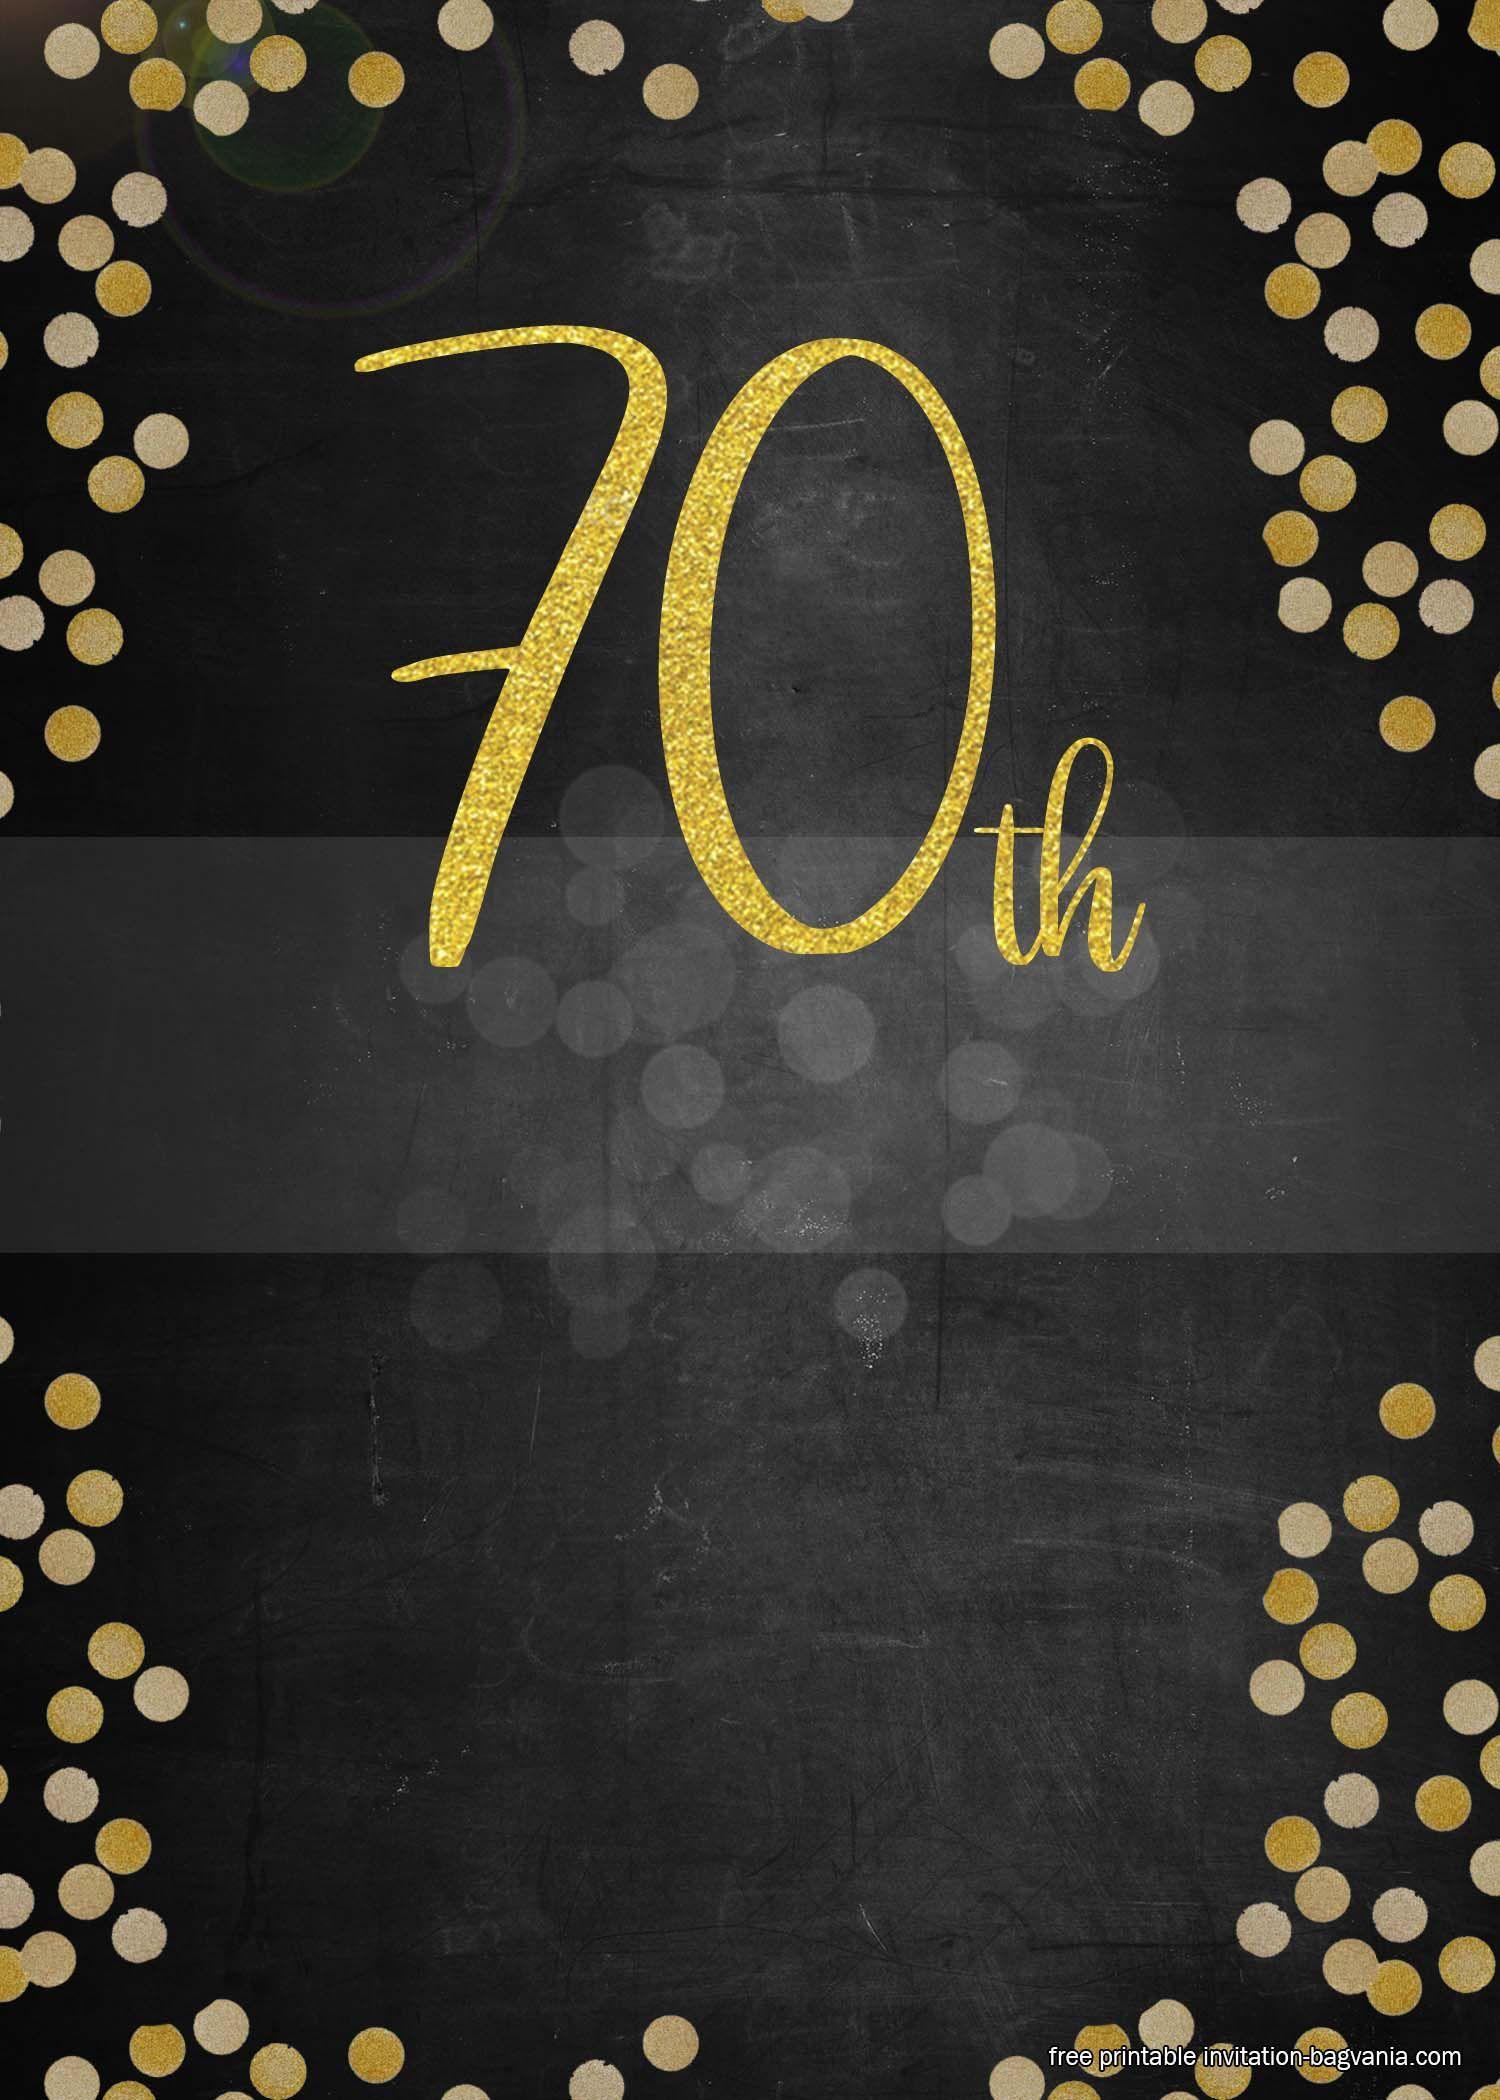 006 Striking 70th Birthday Invitation Template Free Inspiration  Surprise Invite With PhotoFull